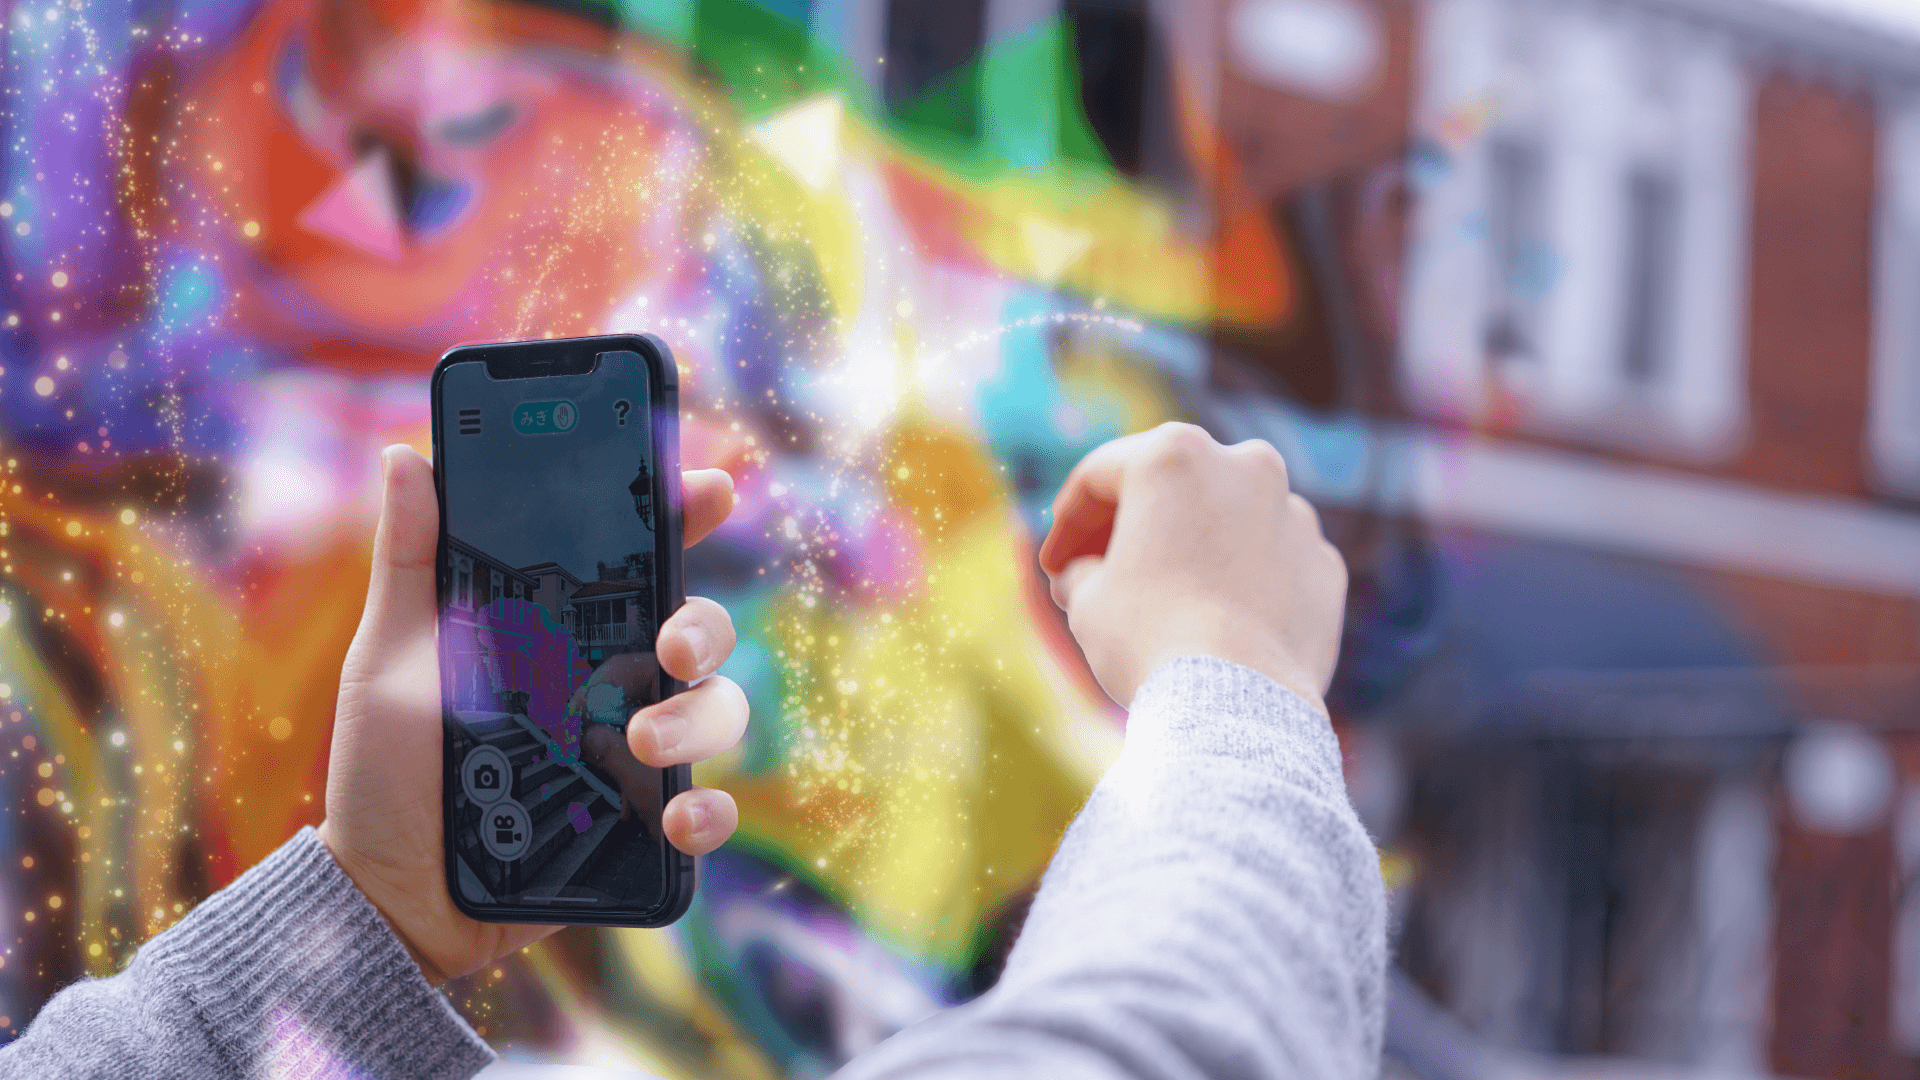 ARアプリ「パラレルインク」がリリース!手から溢れる「魔法のインク」で世界を好きな色に塗り替えよう